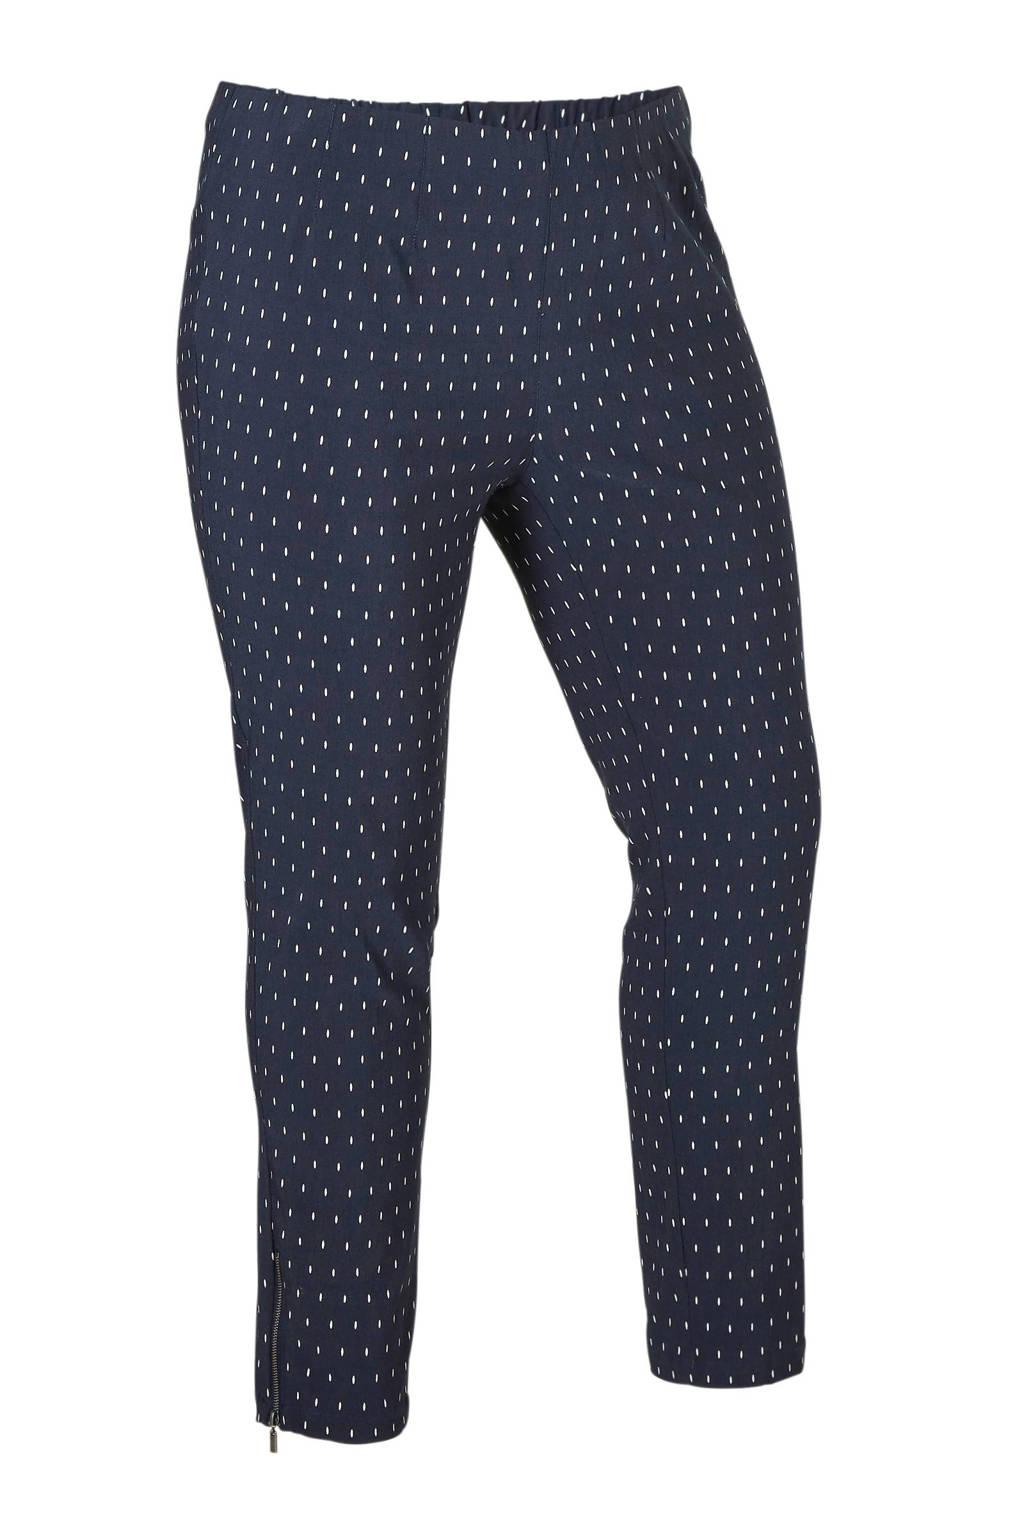 Ciso broek met stipdetails, Donkerblauw/wit